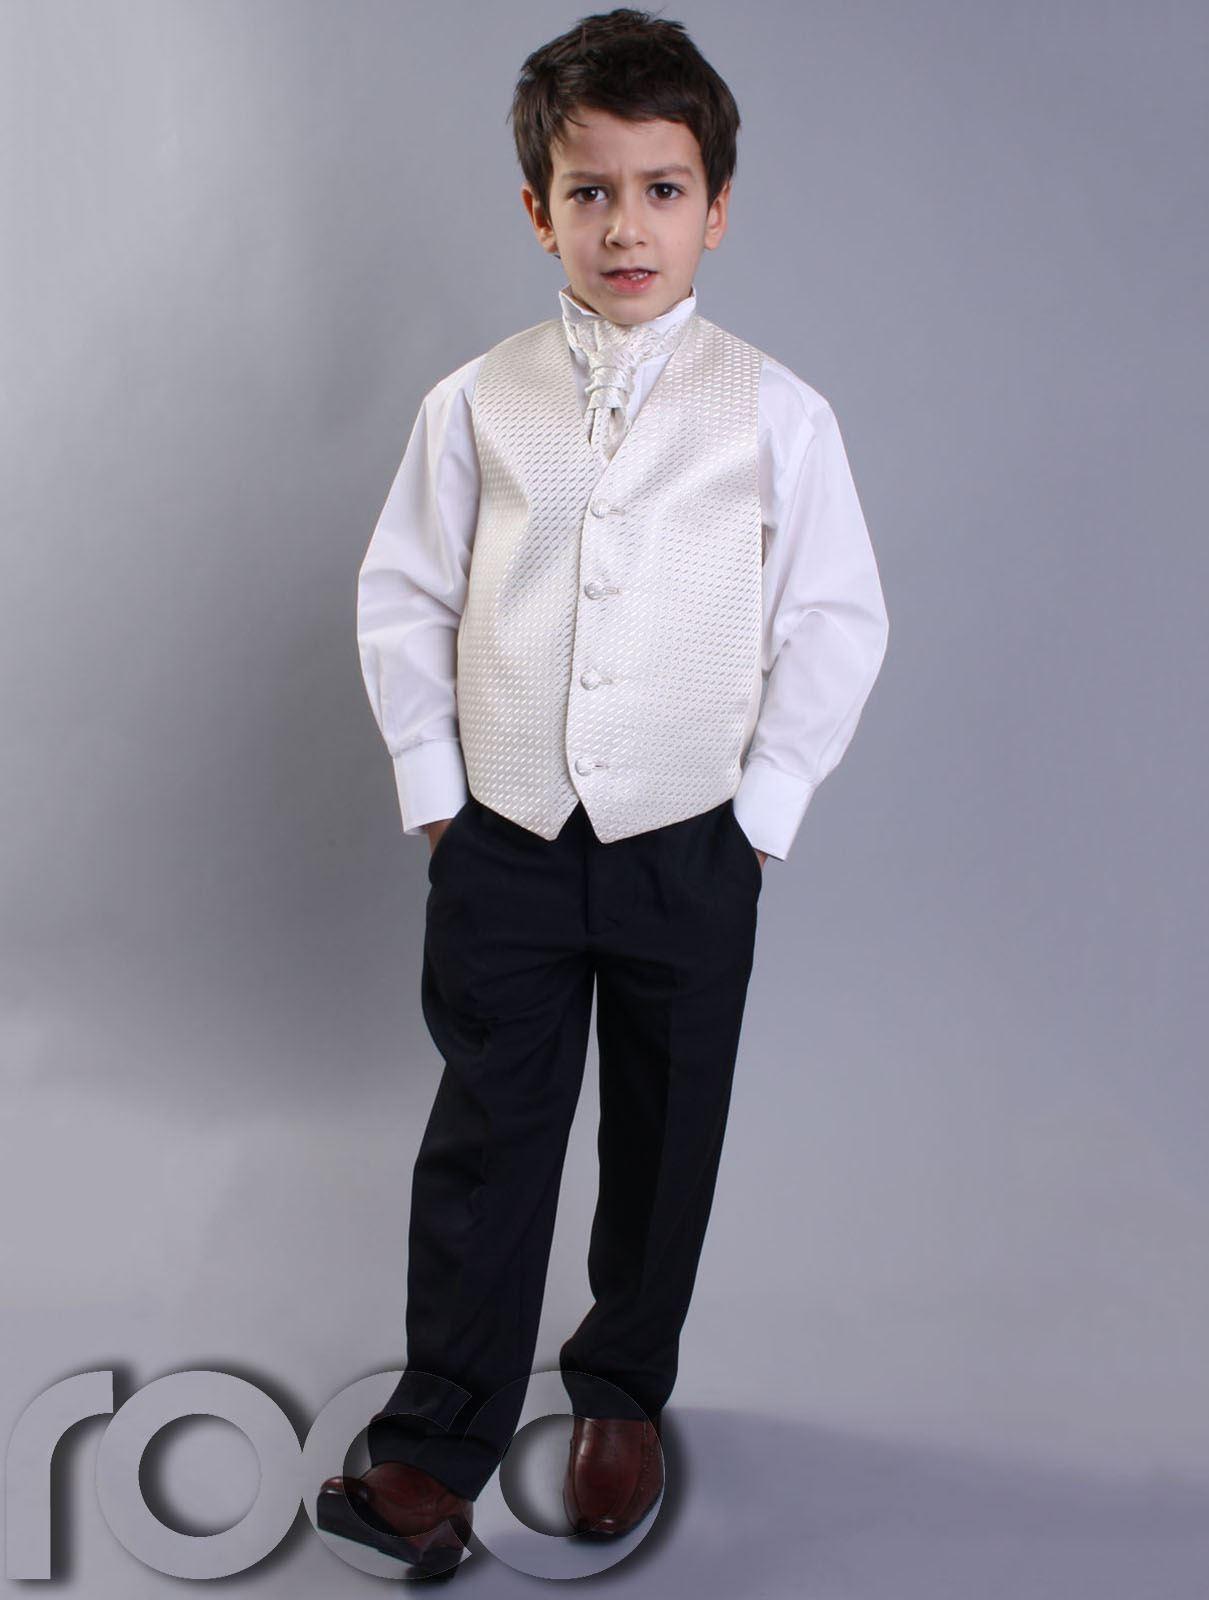 Boys Black & Ivory Suit, Page Boy Suits, Prom Suits, Boys ...